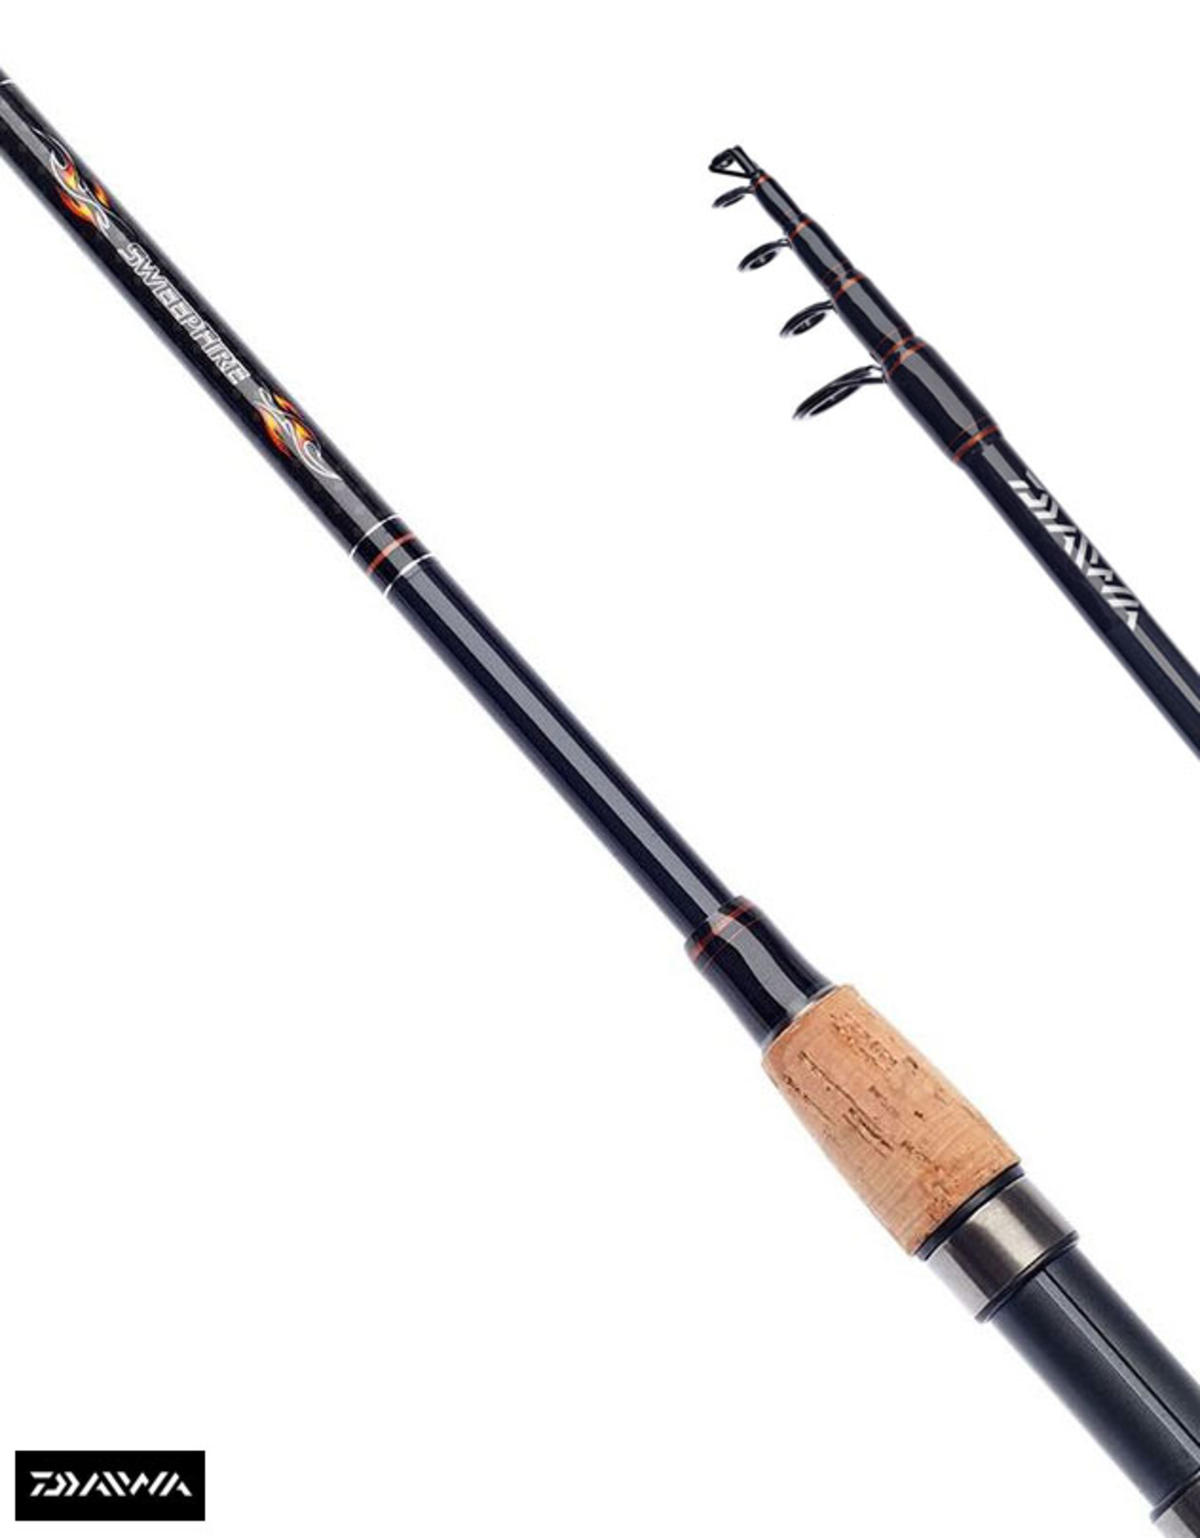 Ex Display Daiwa Sweepfire Tele Spin Rod 9ft / 20-60g  - SW270TH-BU